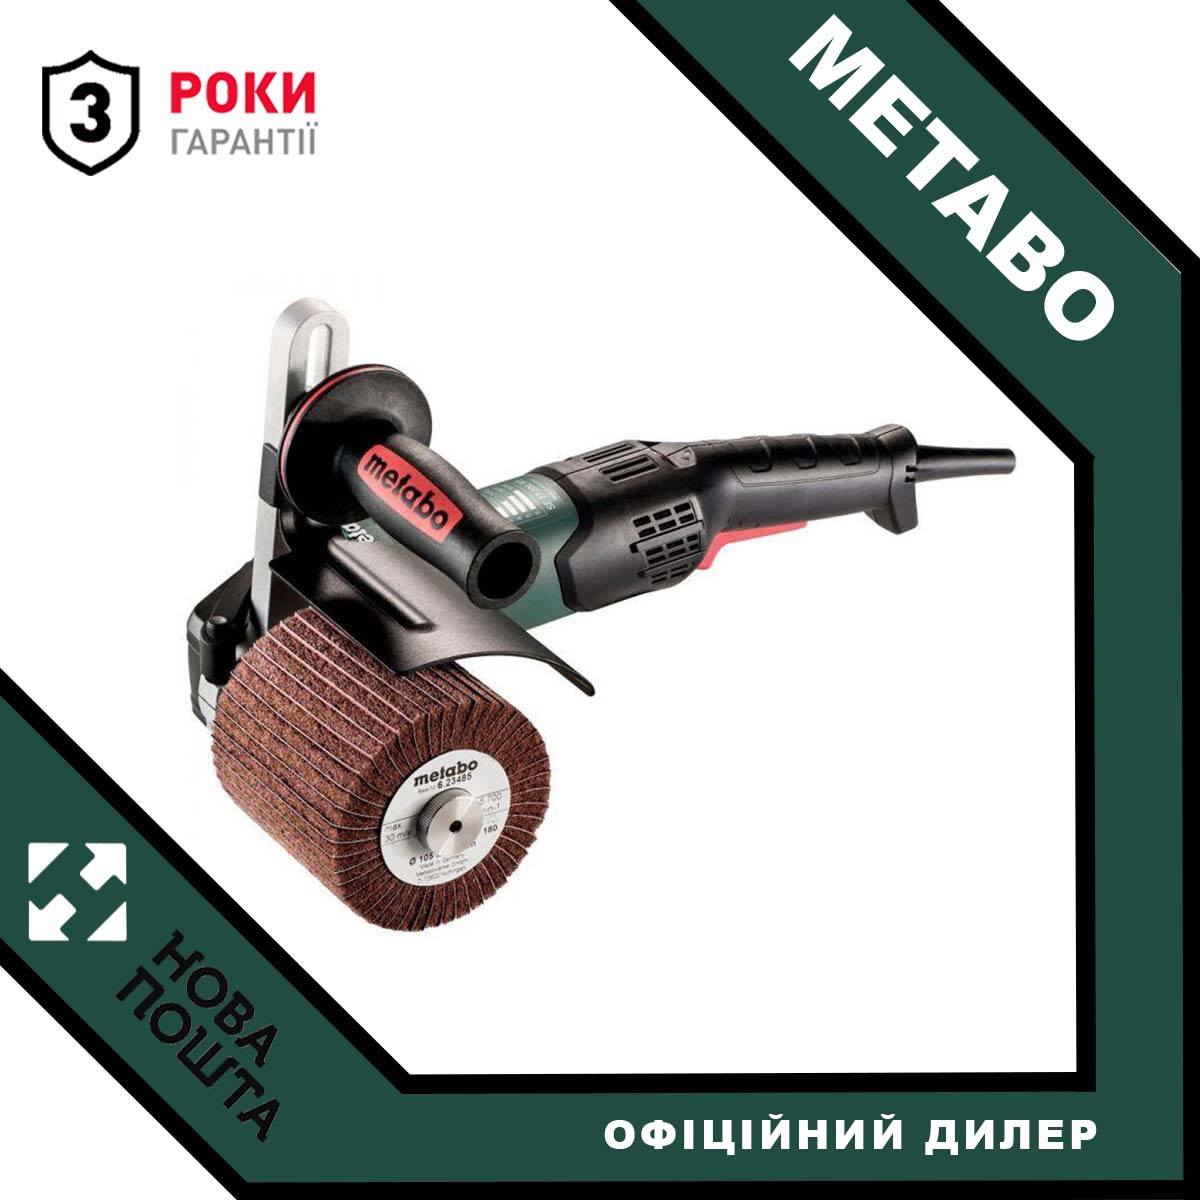 Шлифовальная машина Metabo SE 17-200 RT